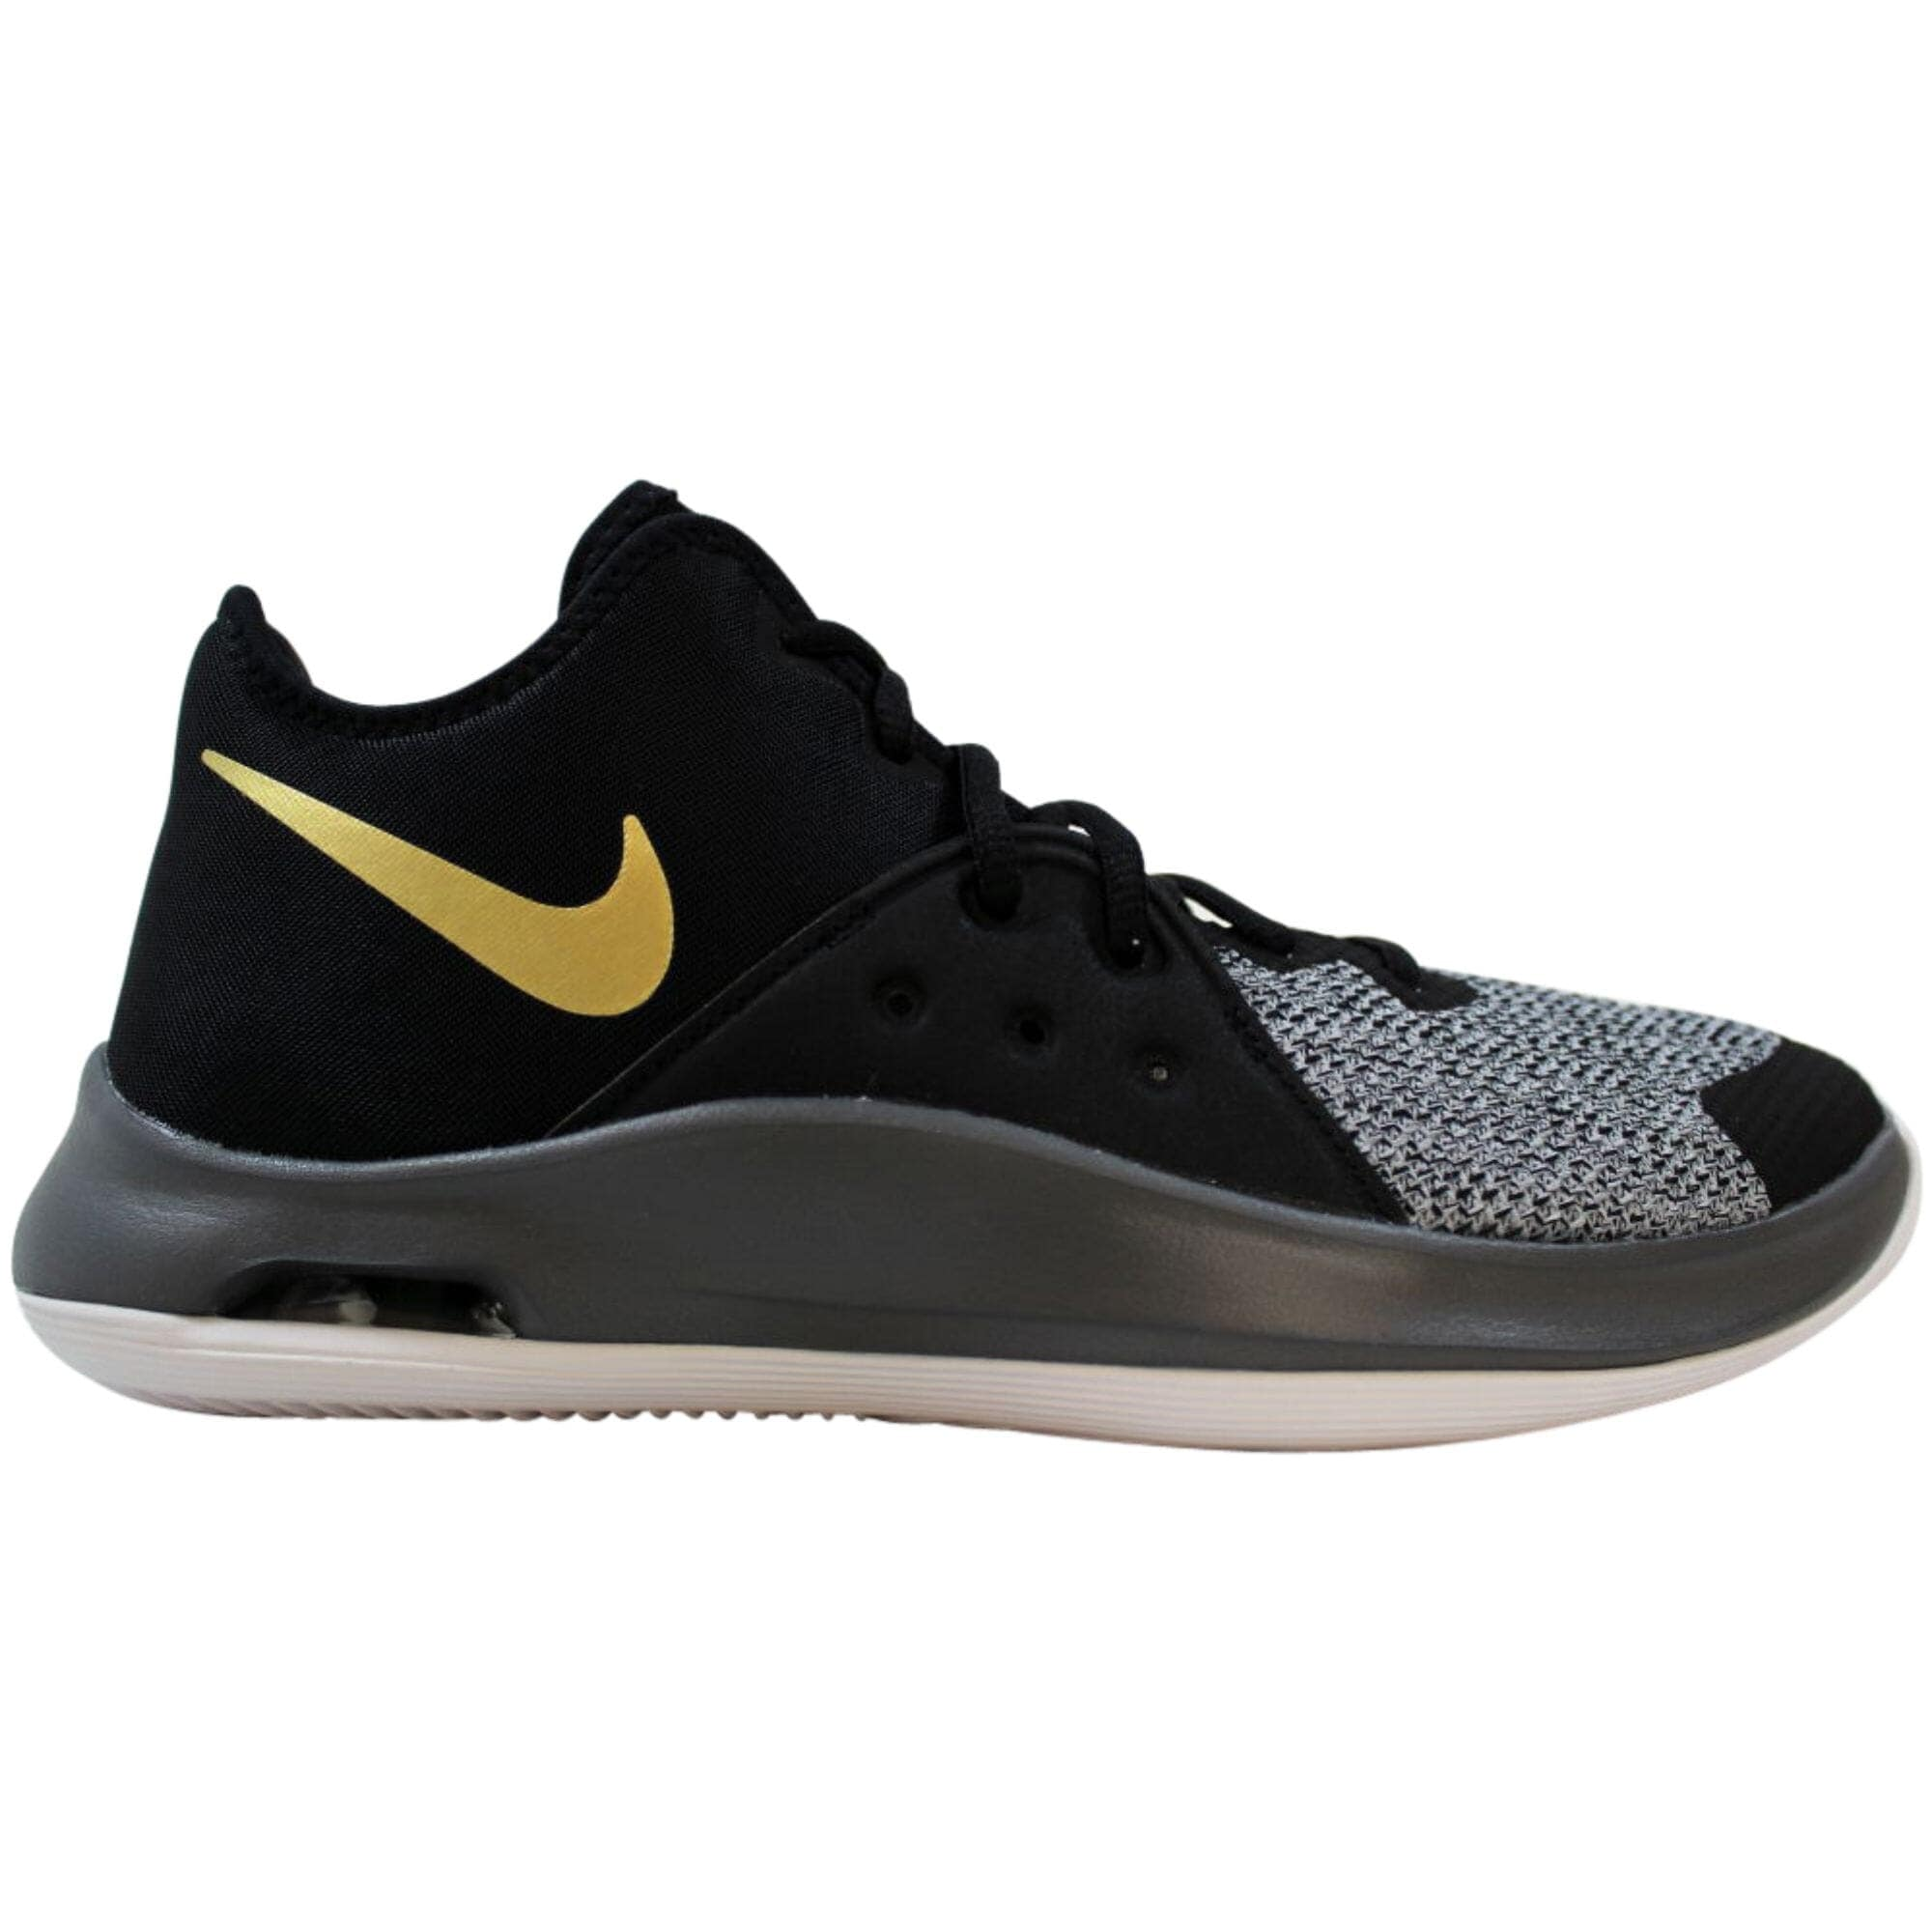 Nike Air Versitile III 3 Black/Metallic